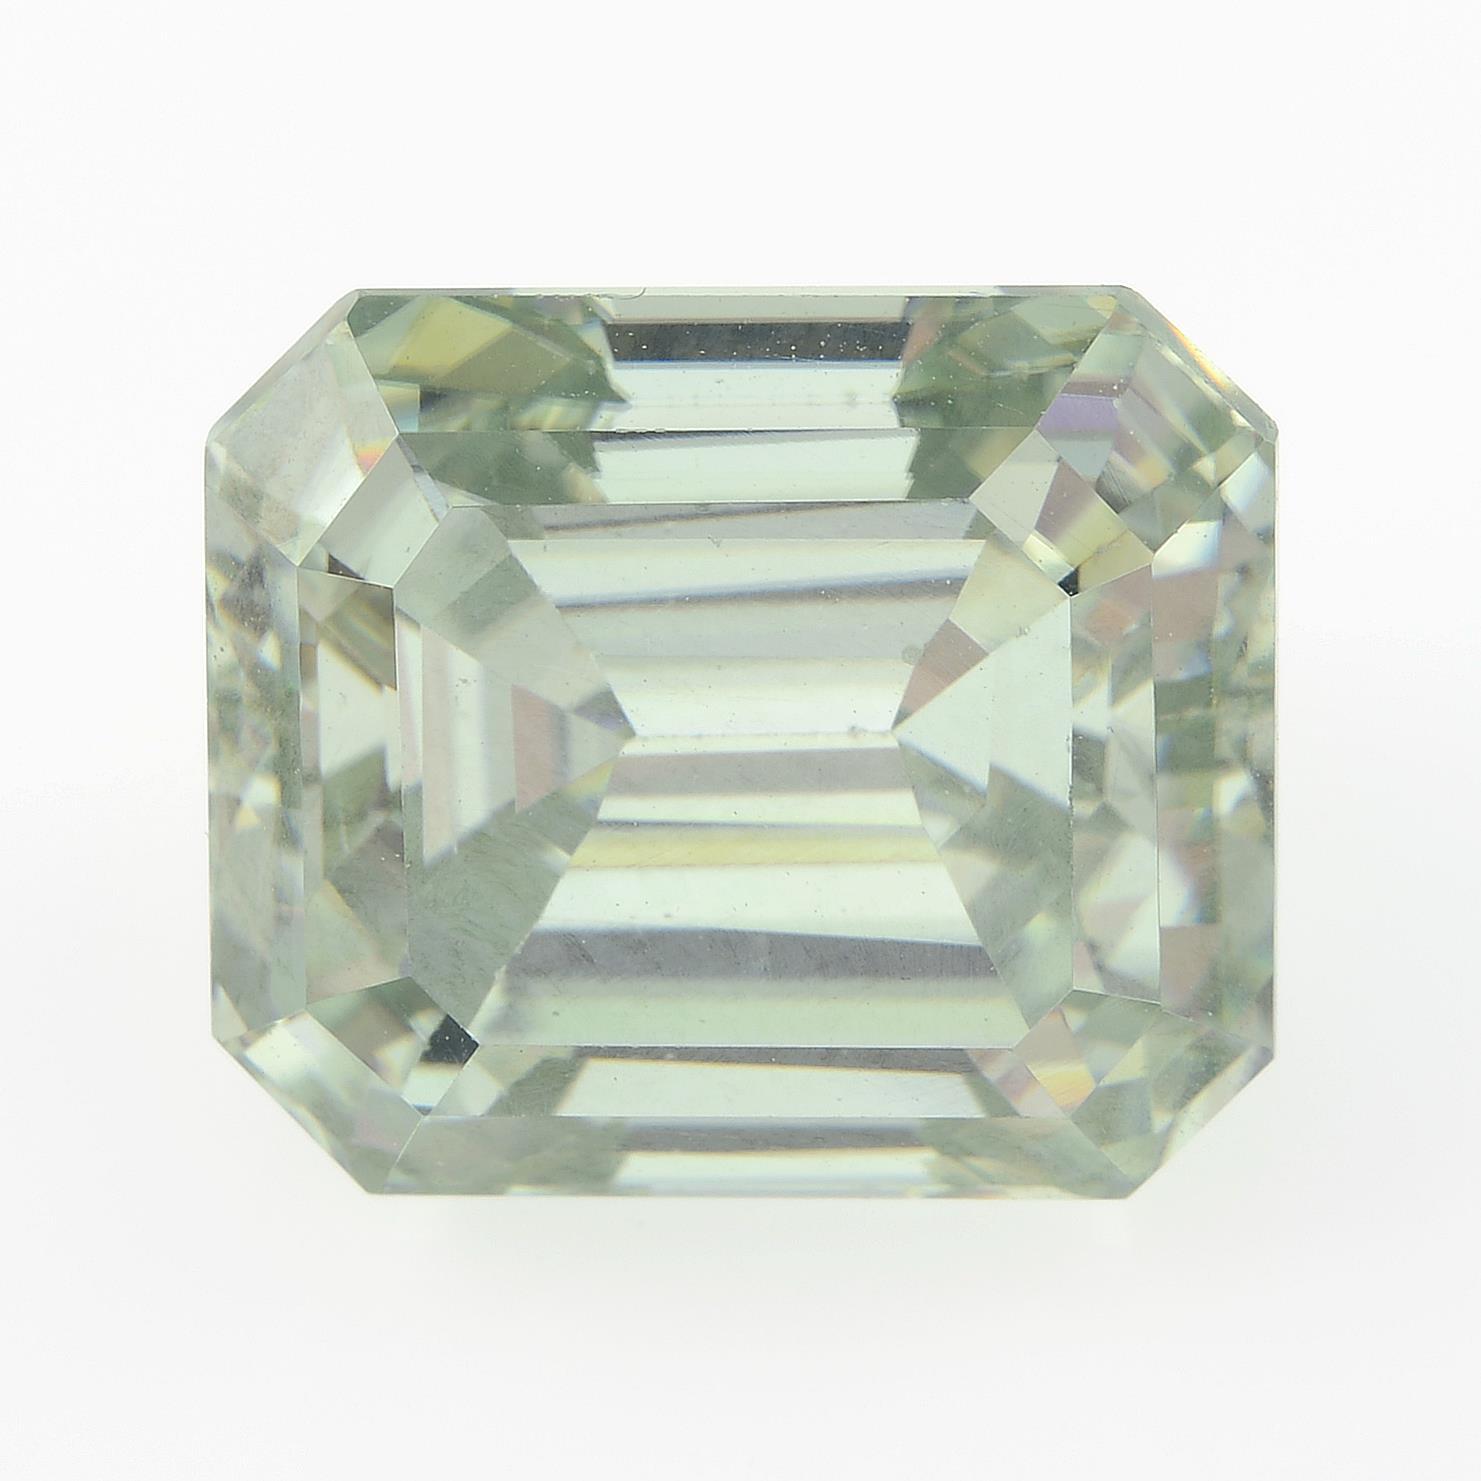 A rectangular-shape synthetic moissanite.